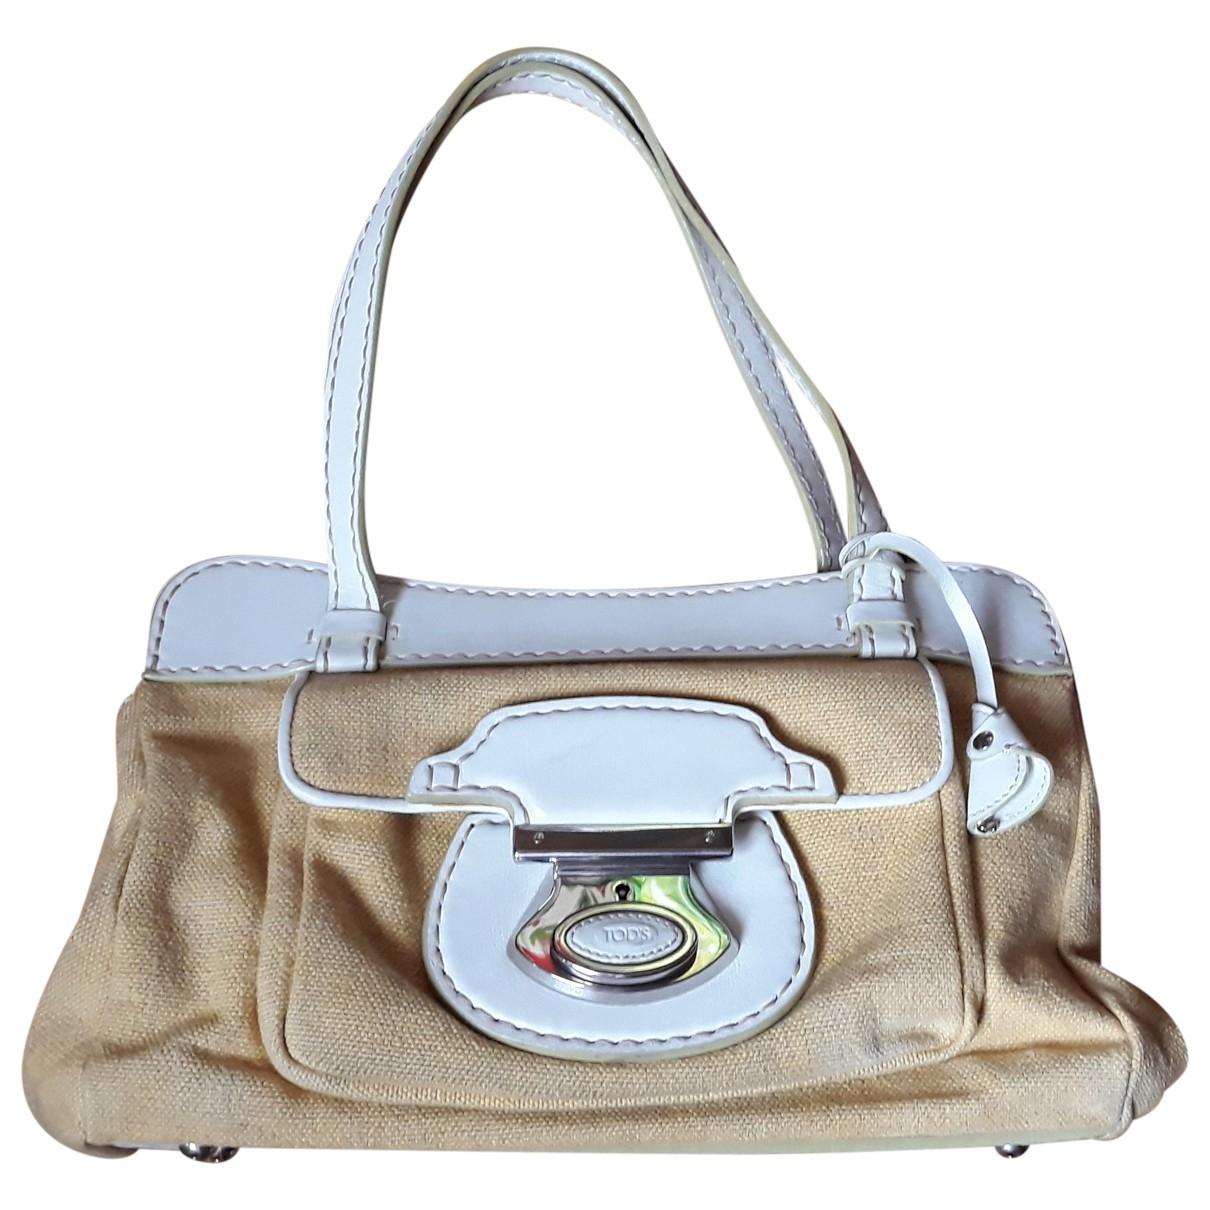 Tod's \N Yellow Leather handbag for Women \N